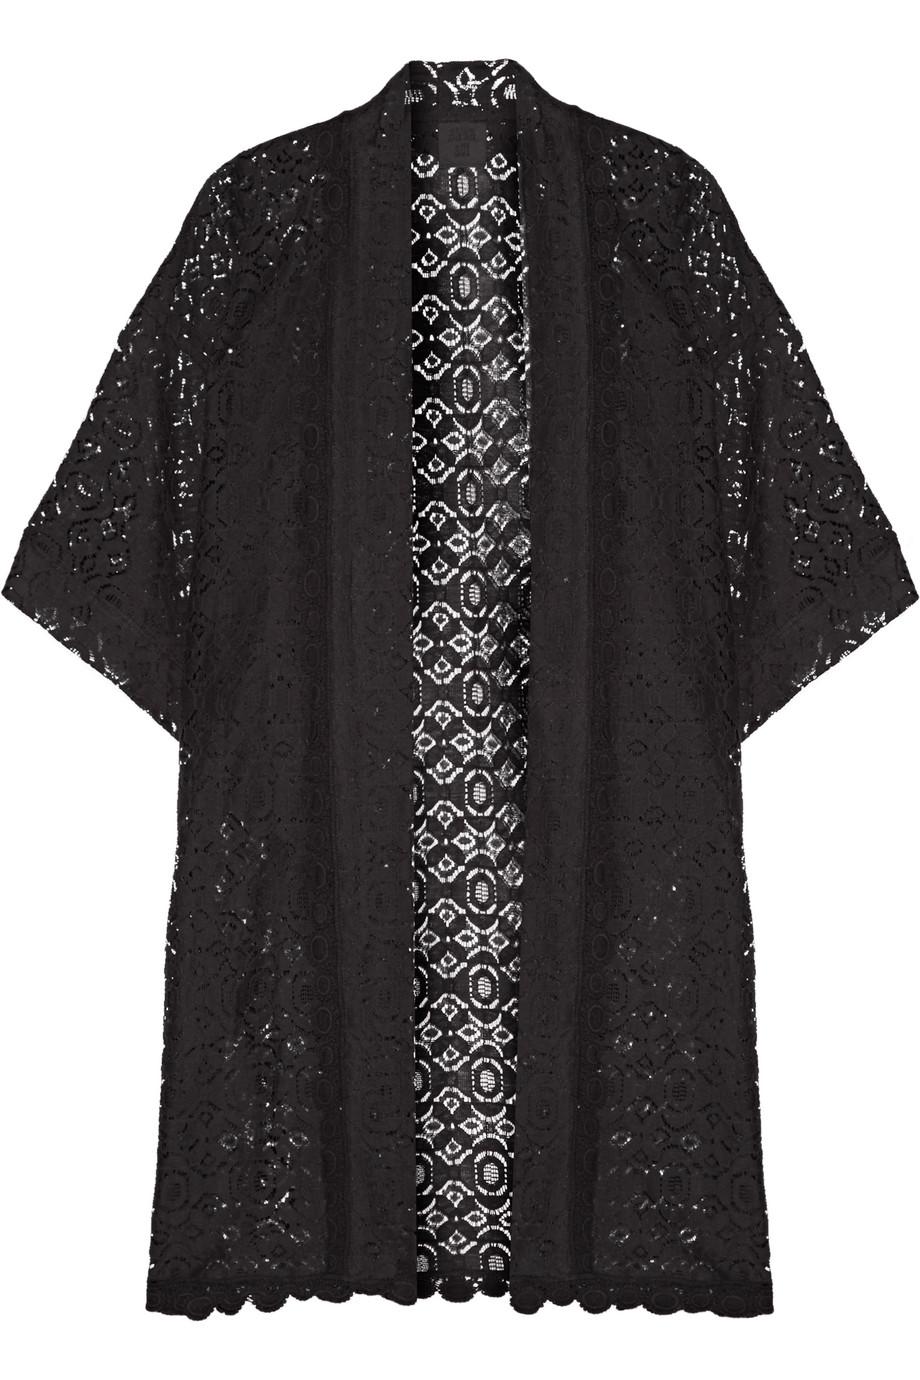 Anna Sui Lace Kimono Jacket, Black, Women's, Size: M/L